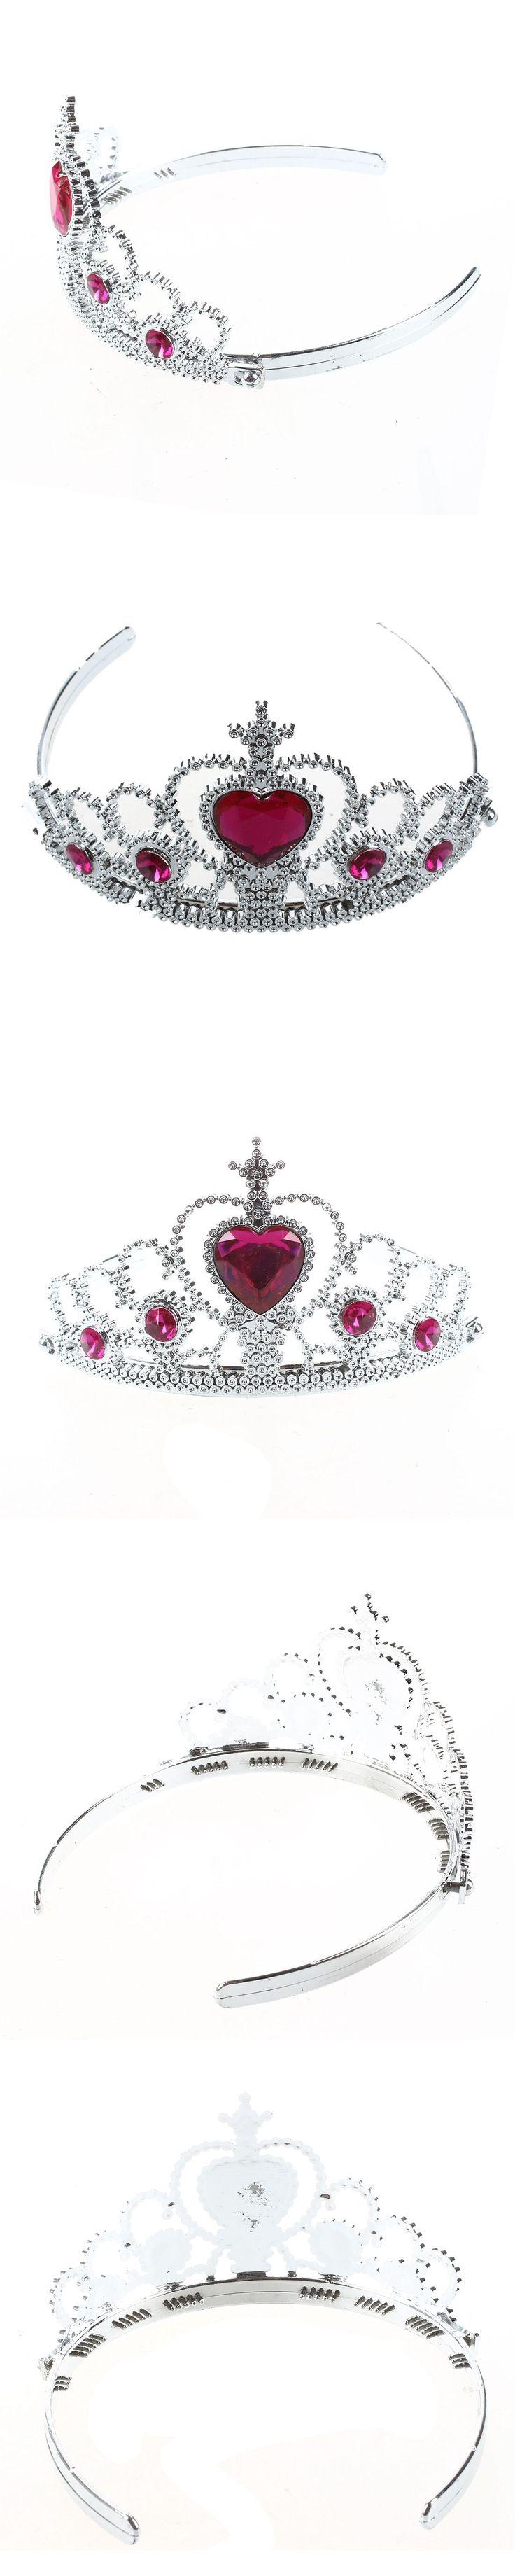 Woman Party Crown Plastic Red Heart Round Rhinestone Headband Hair Band